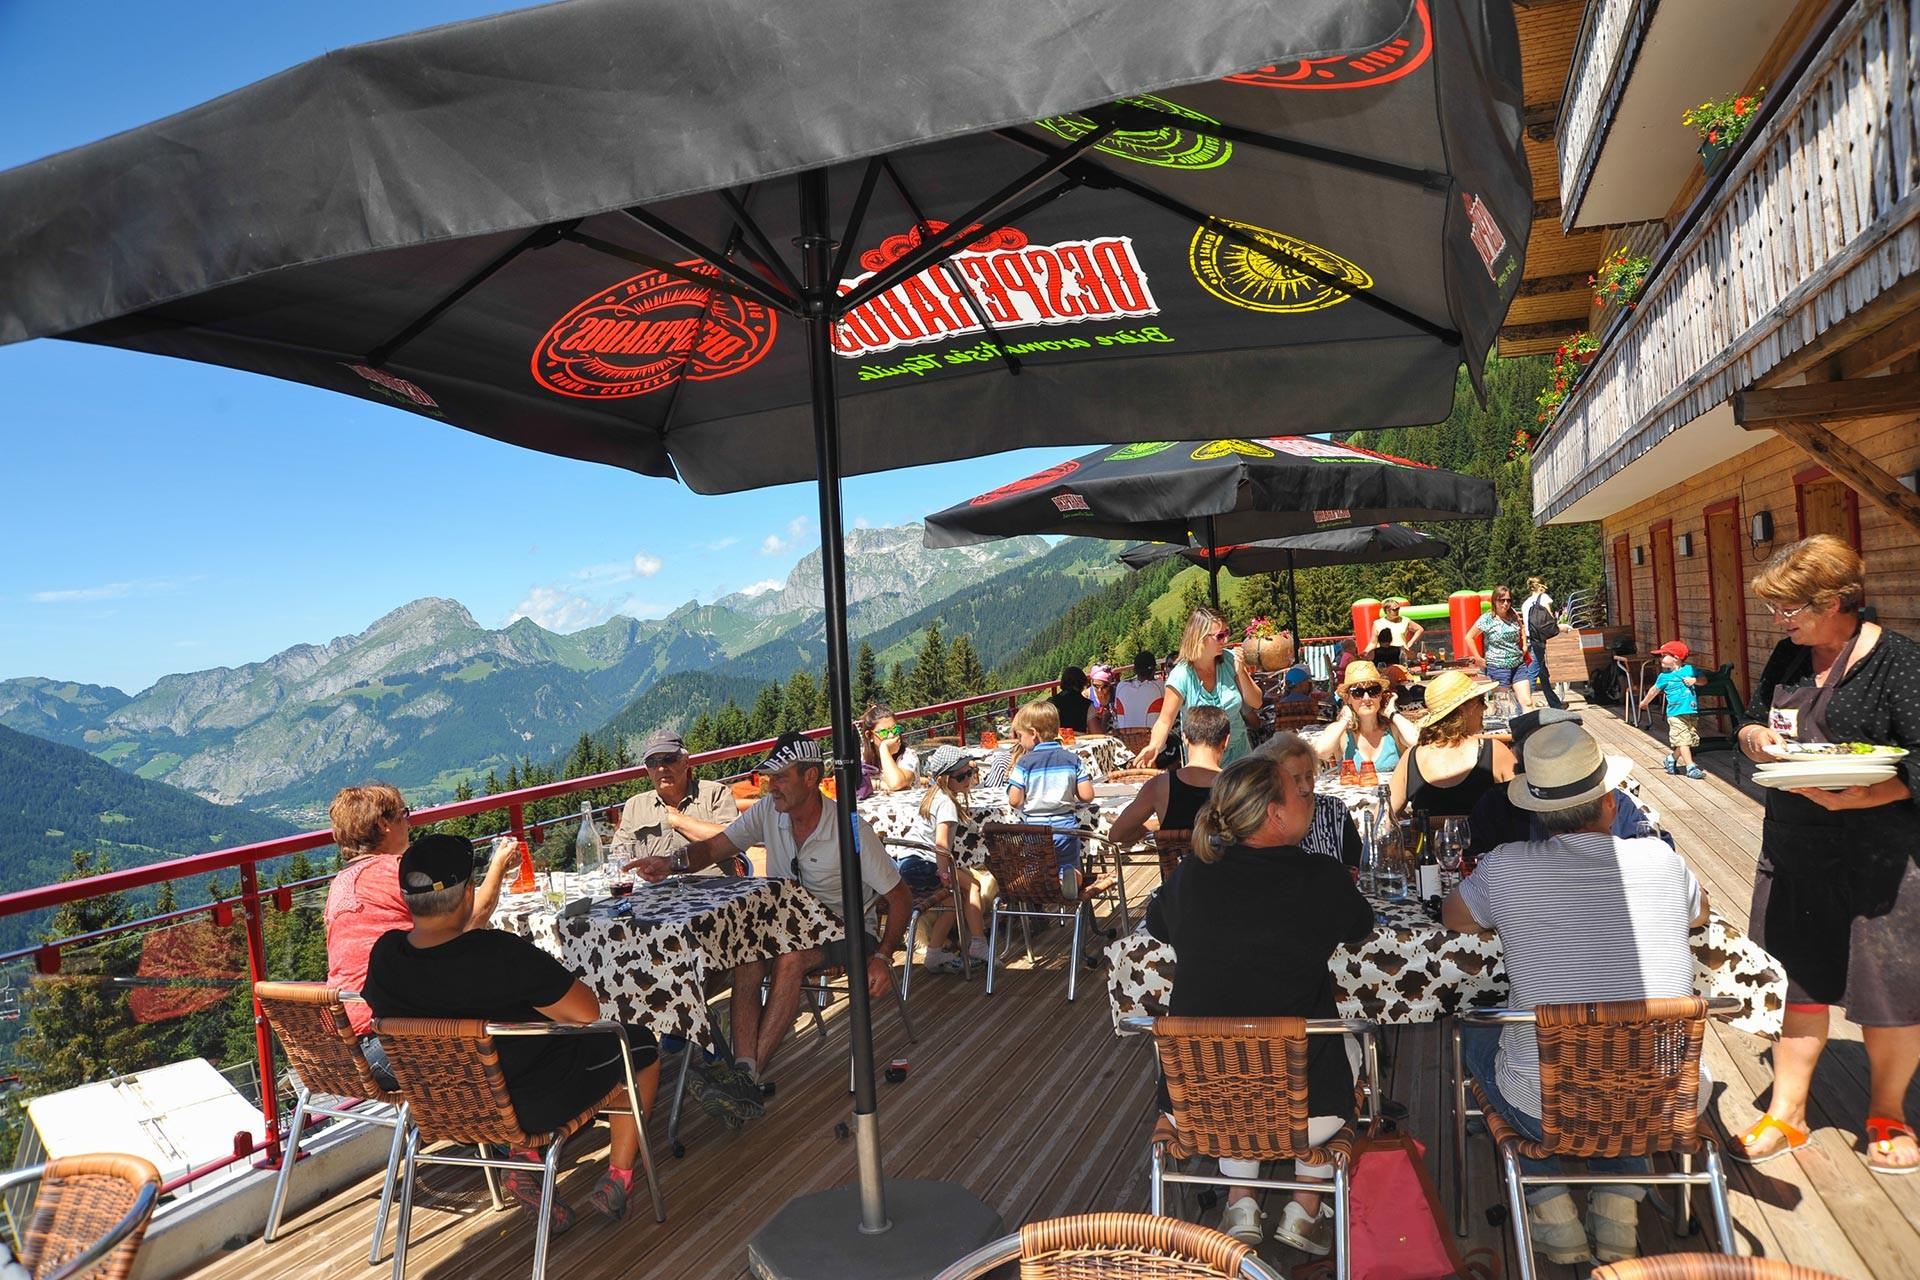 Restaurants in the mountain